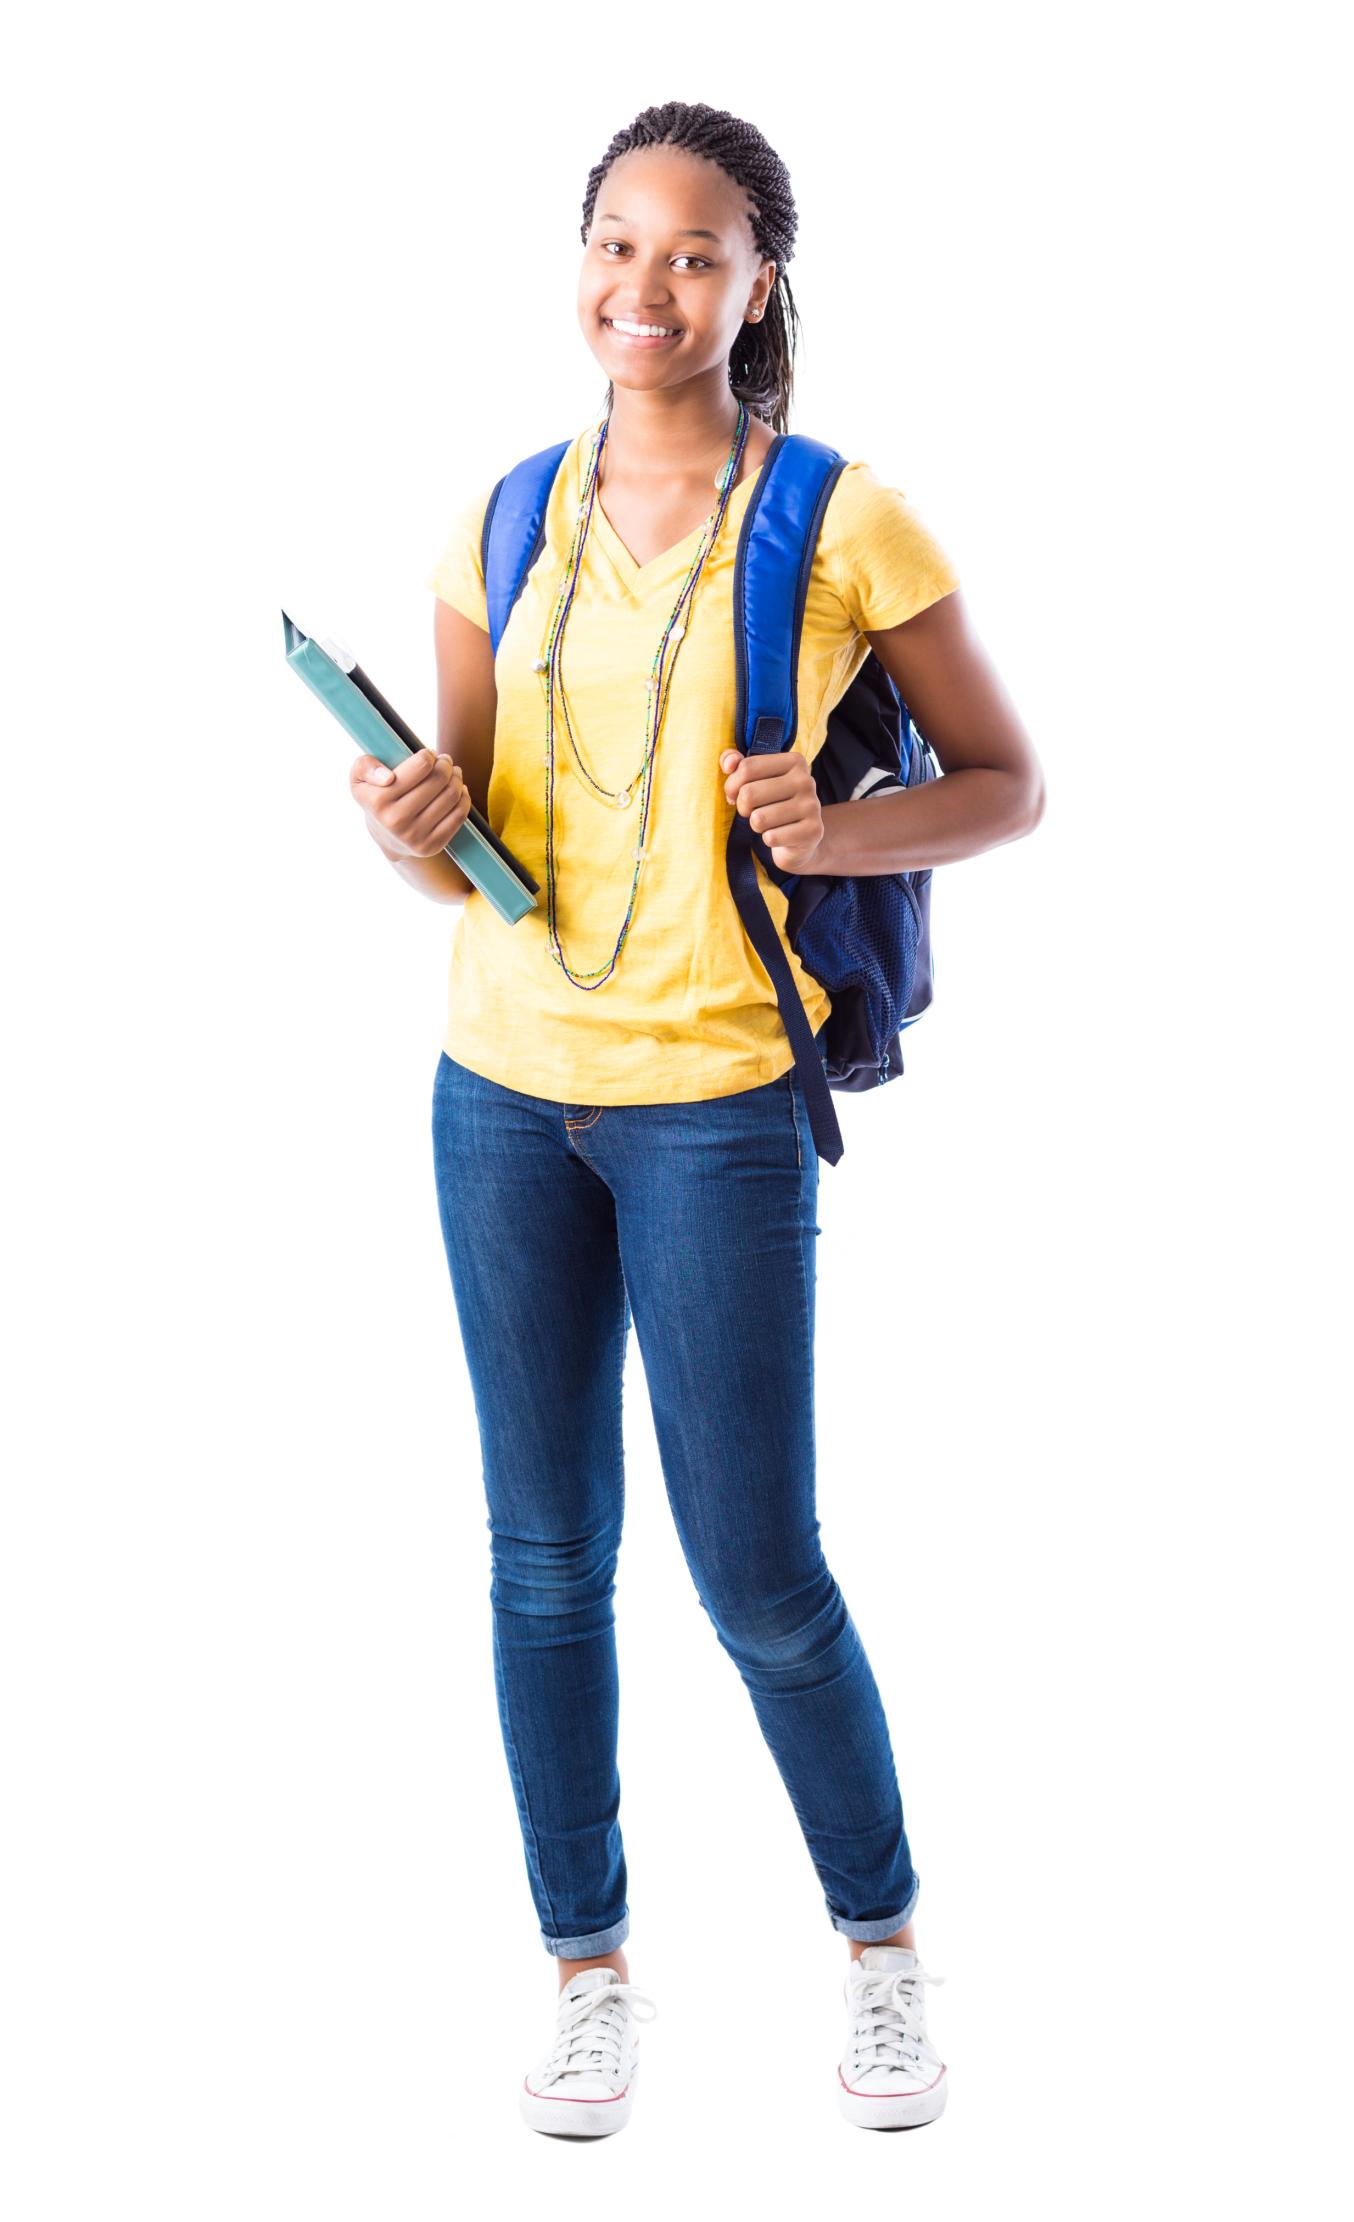 Full length portrait of African American high school girl